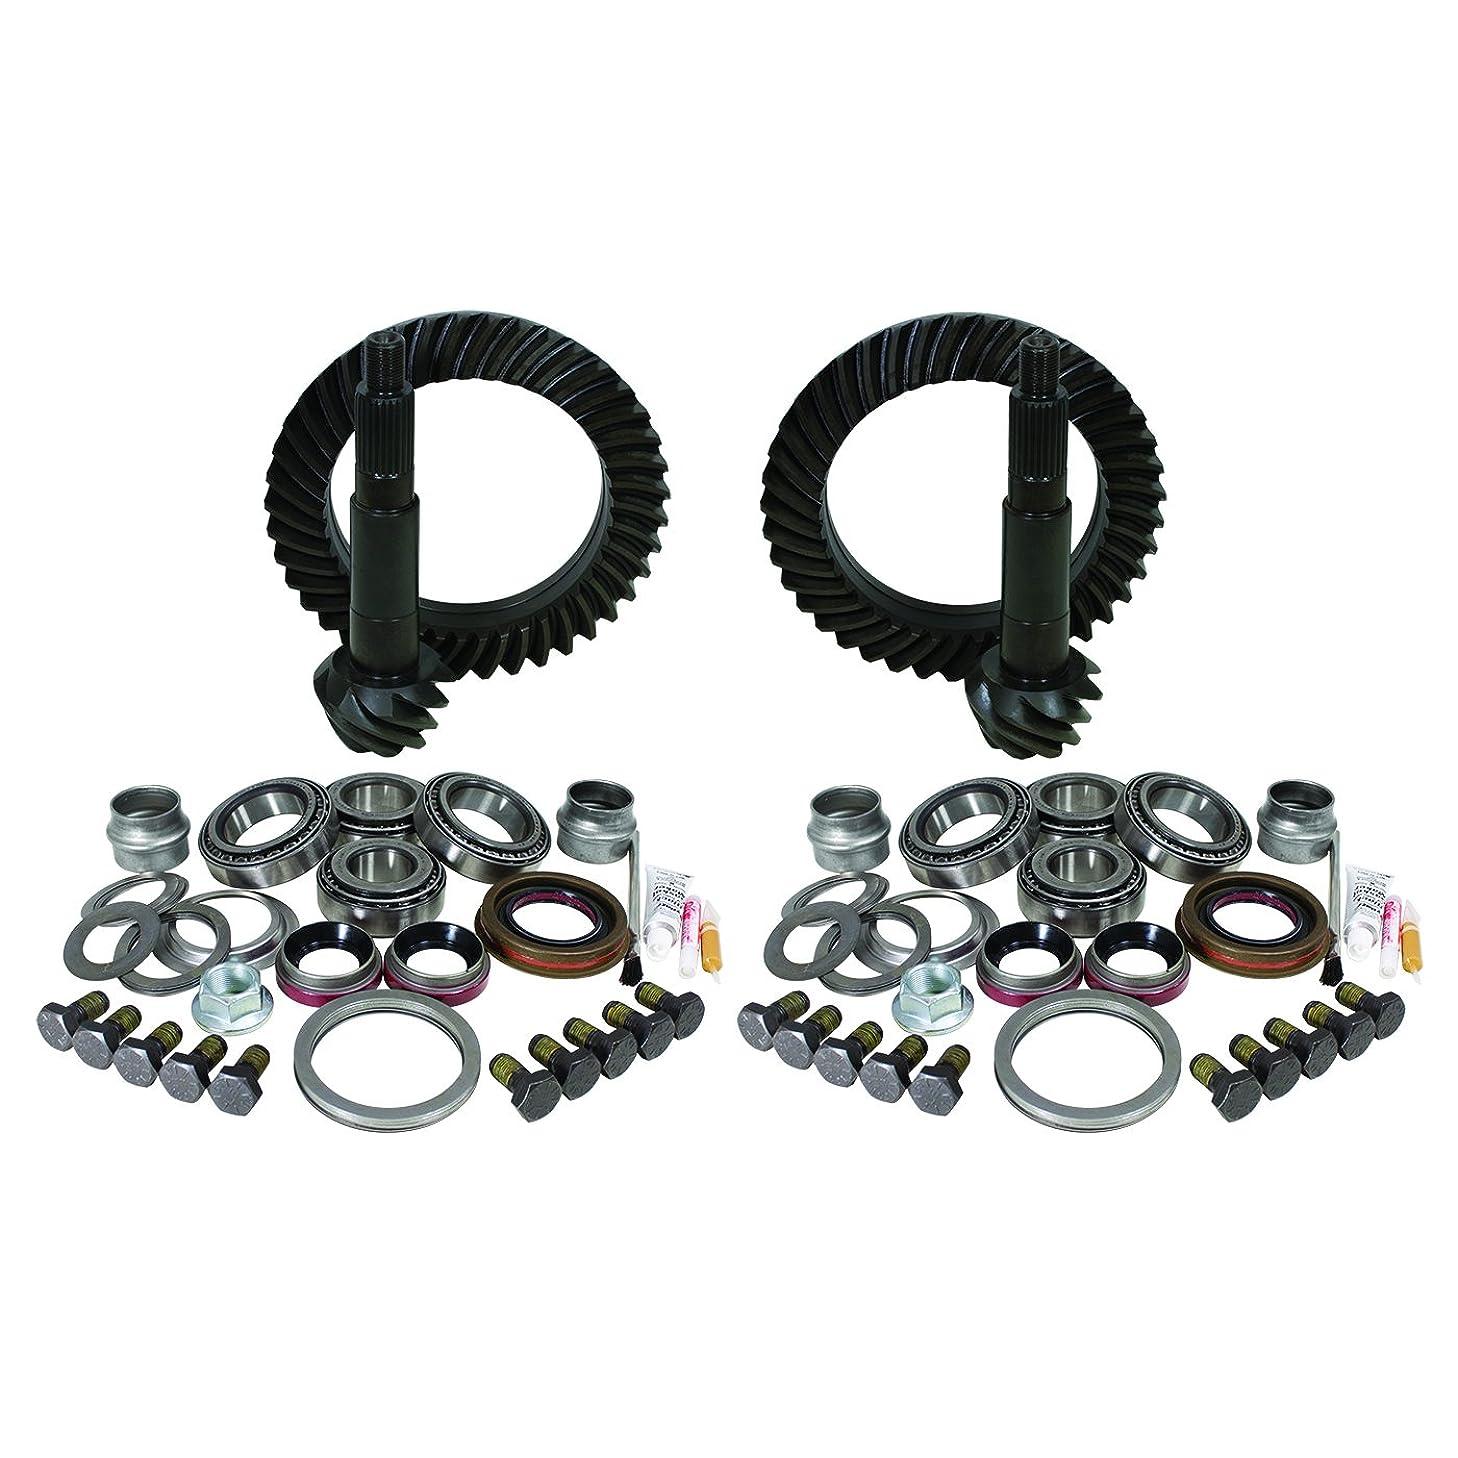 Yukon Gear & Axle (YGK015) Install Kit for Jeep JK Rubicon, 4.88 Ratio)